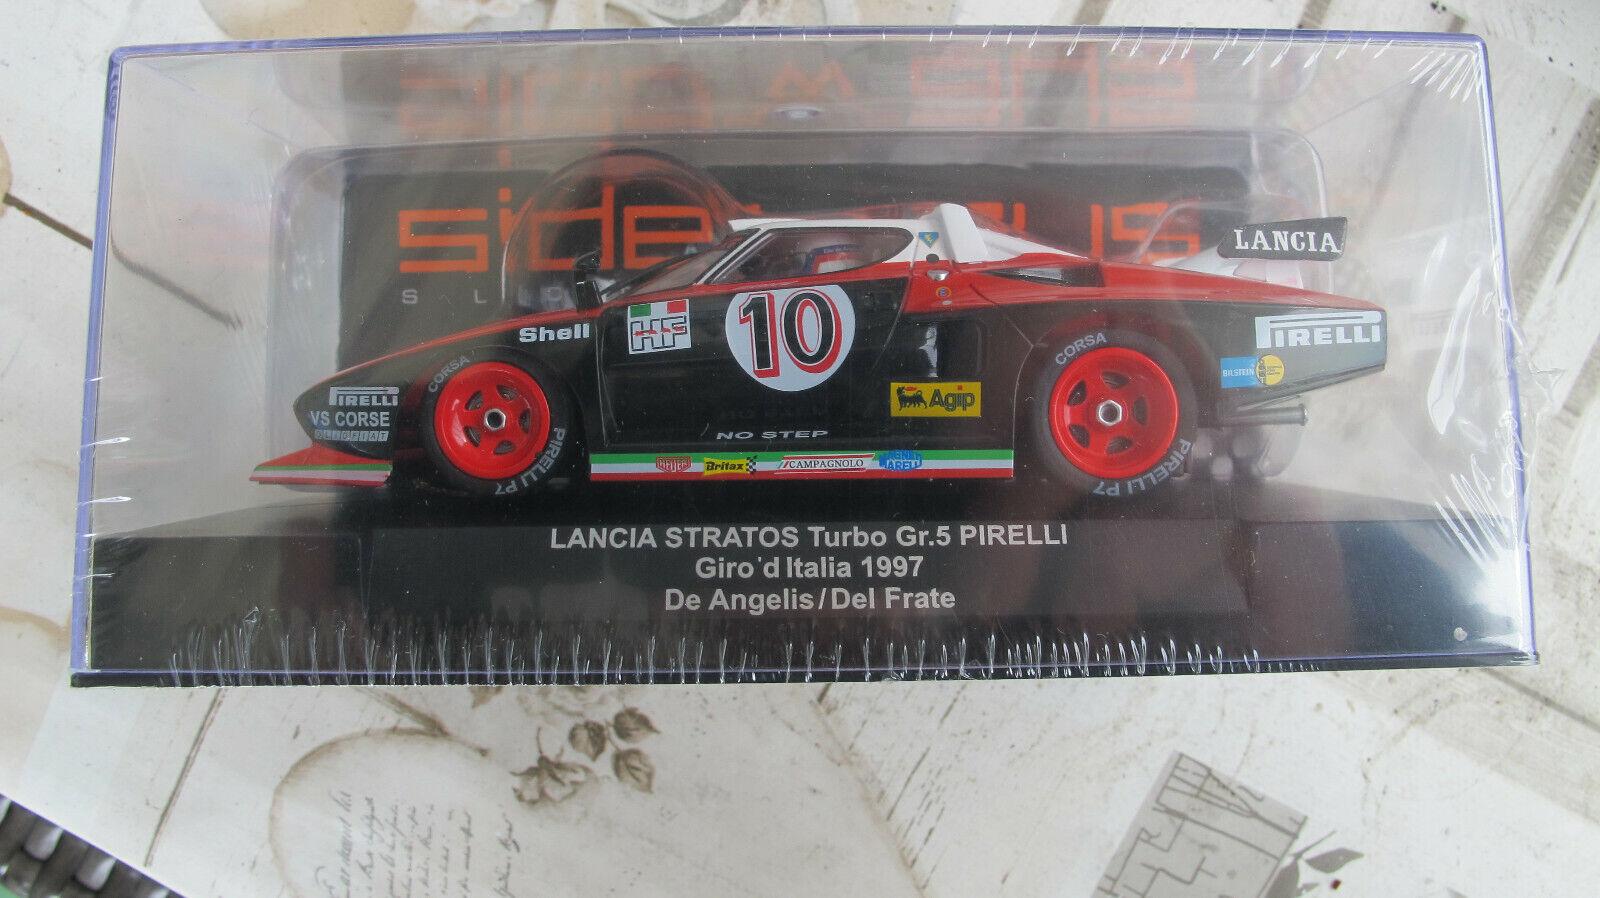 Sideways Racer Lancia Stratos Turbo Pirelli   10  Giro d`Italia 1977  Ref. SW63